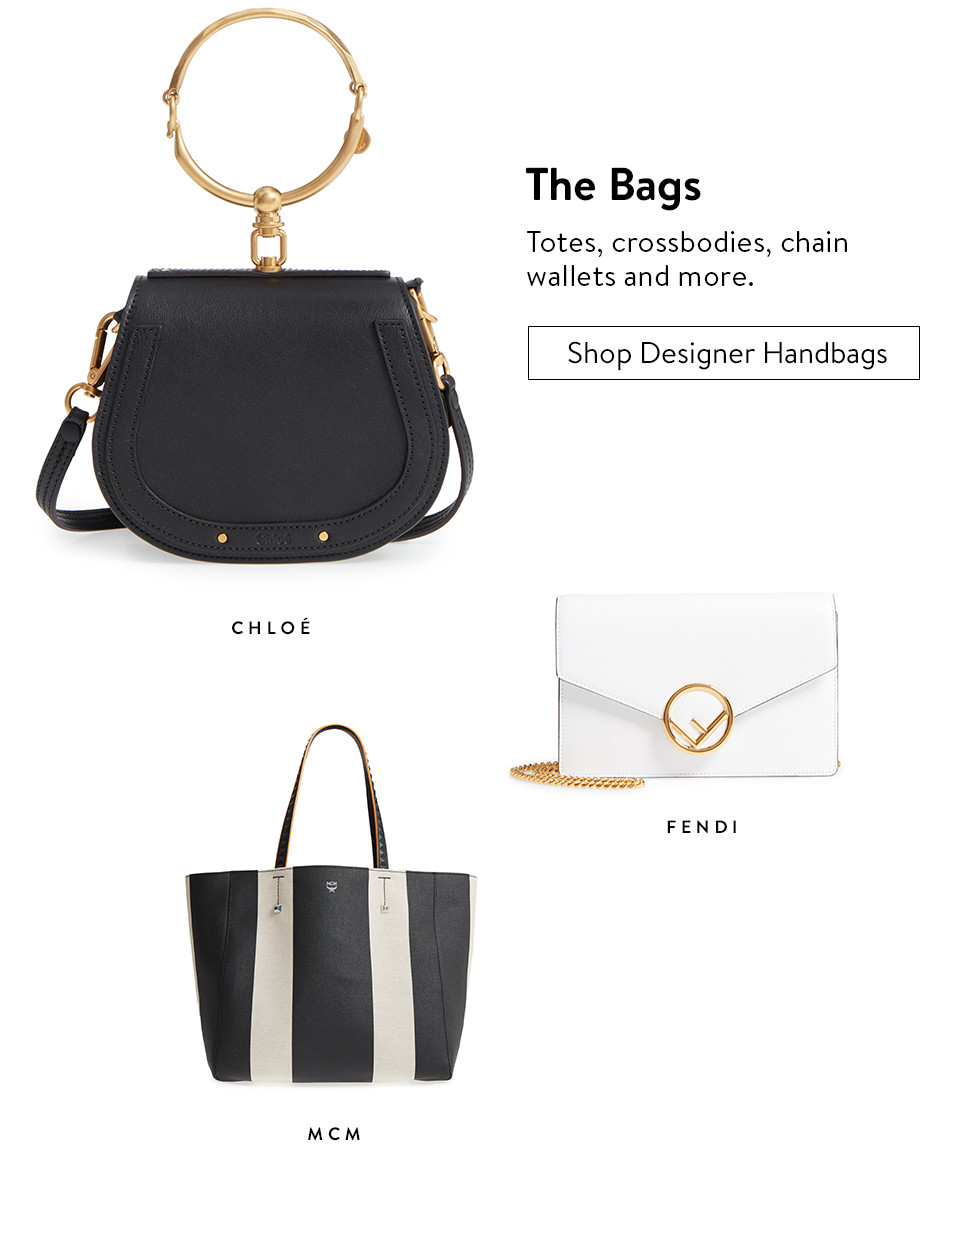 The Bags - Shop Designer Handbags